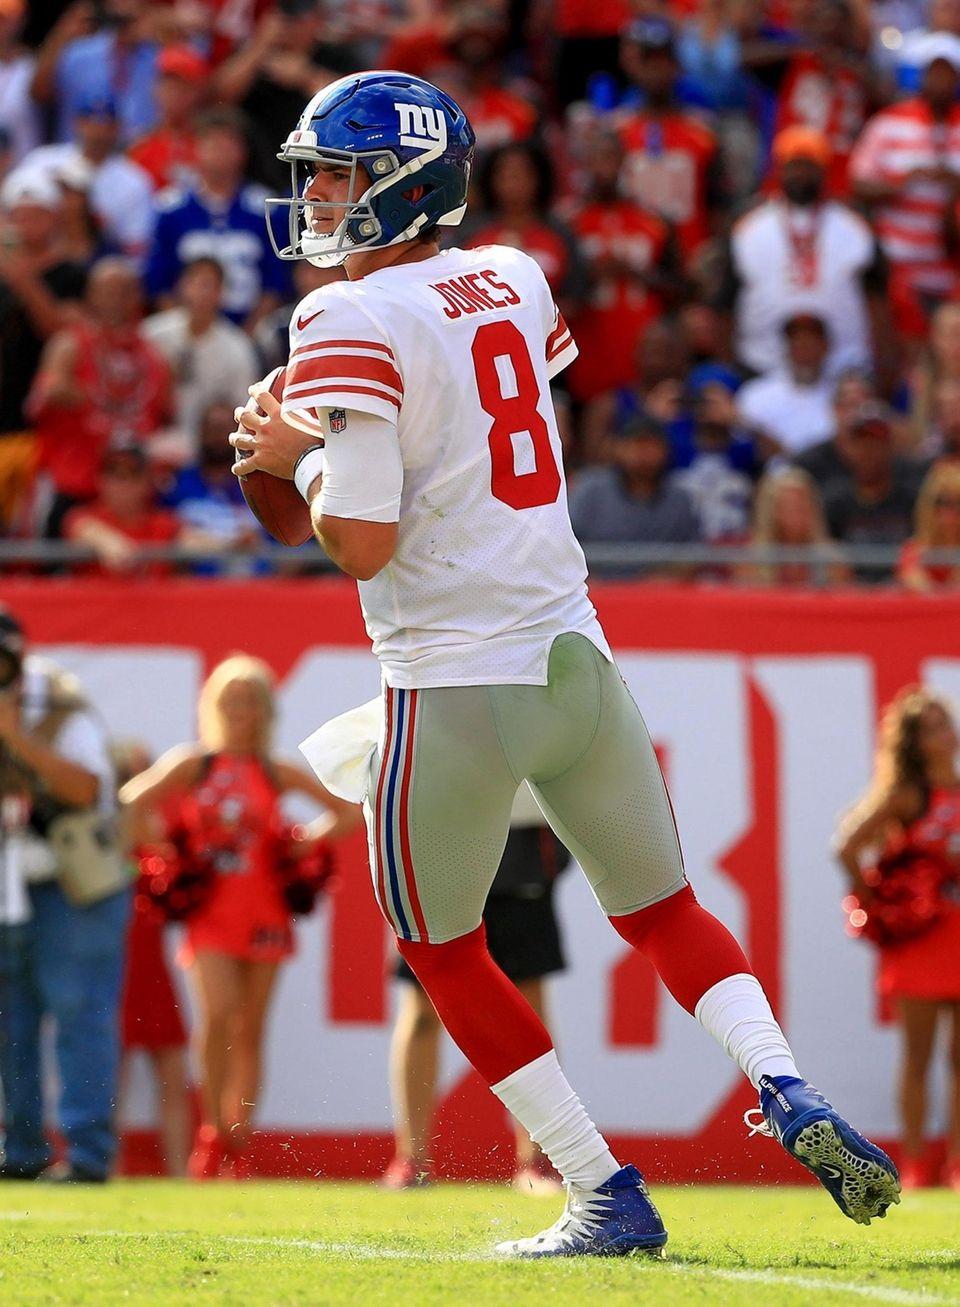 Daniel Jones of the Giants passes during a